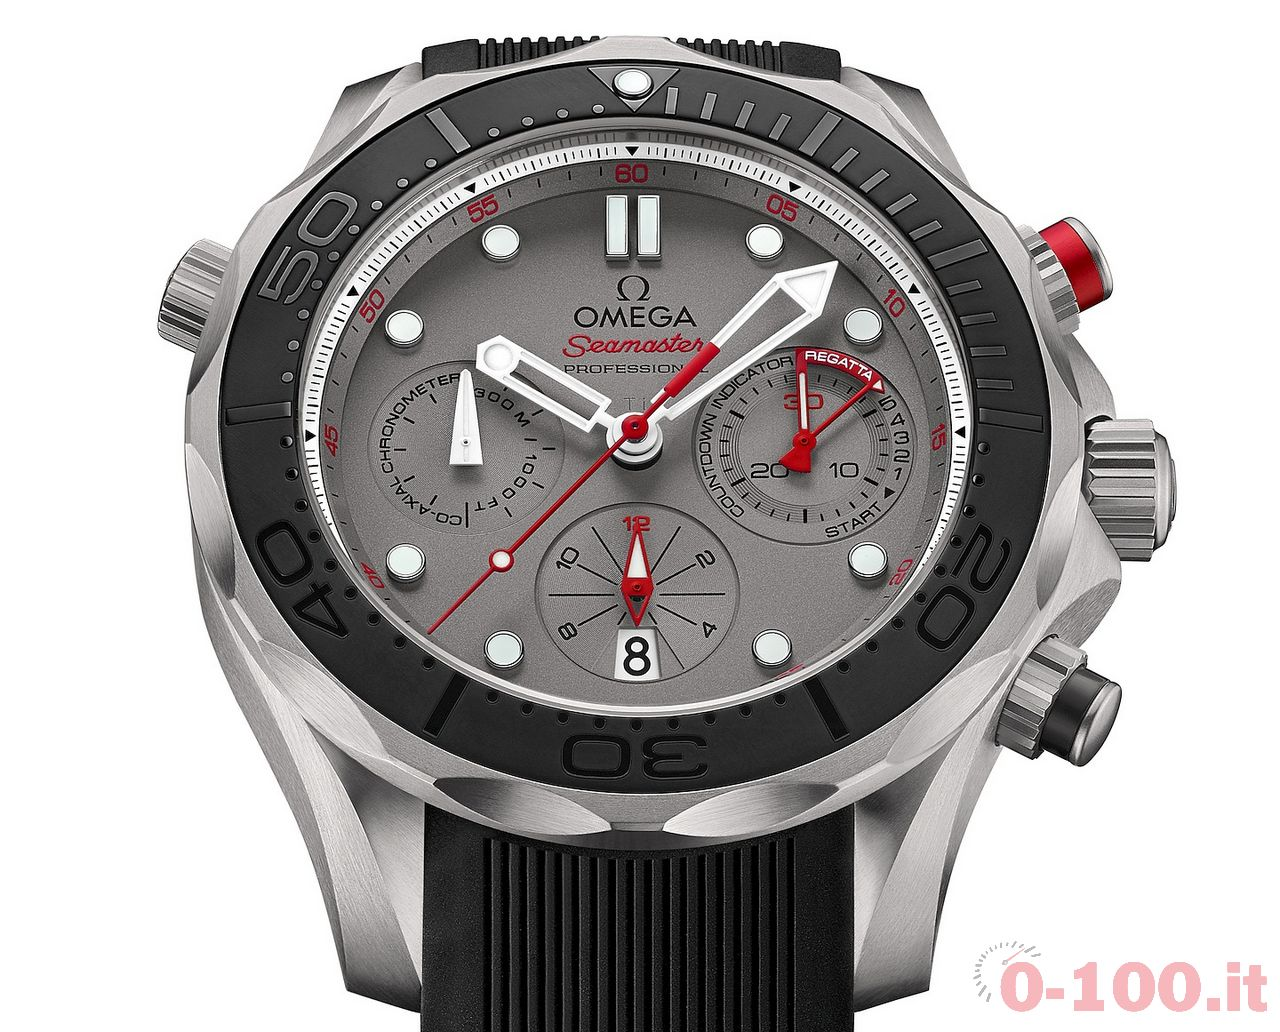 omega-seamaster-diver-300m-etnz-price_0-1004